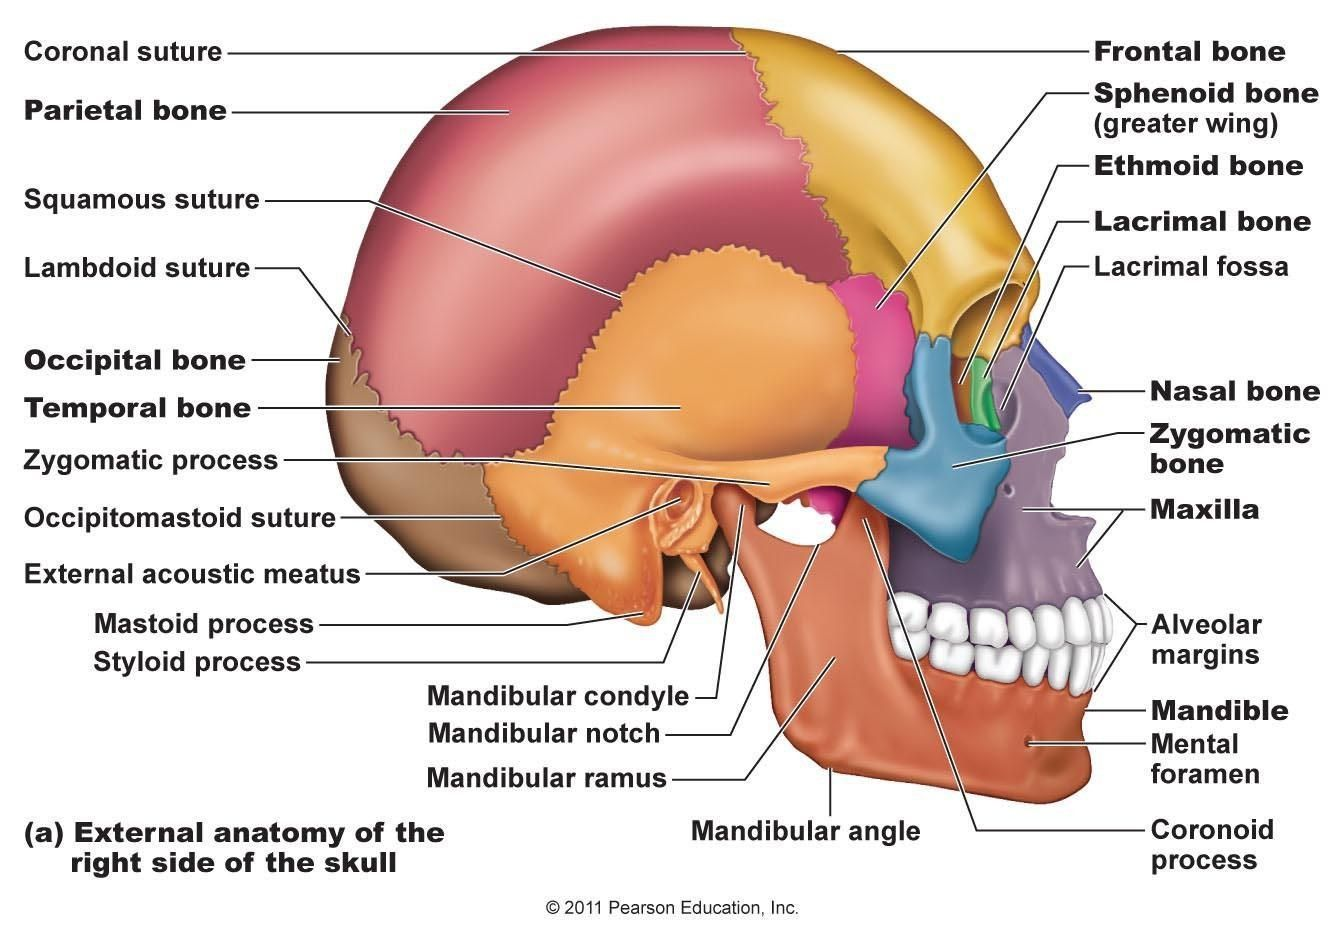 ethmoid bone diagram ethmoid bone diagram diagram of the skull bones diagram of the skull [ 1344 x 940 Pixel ]